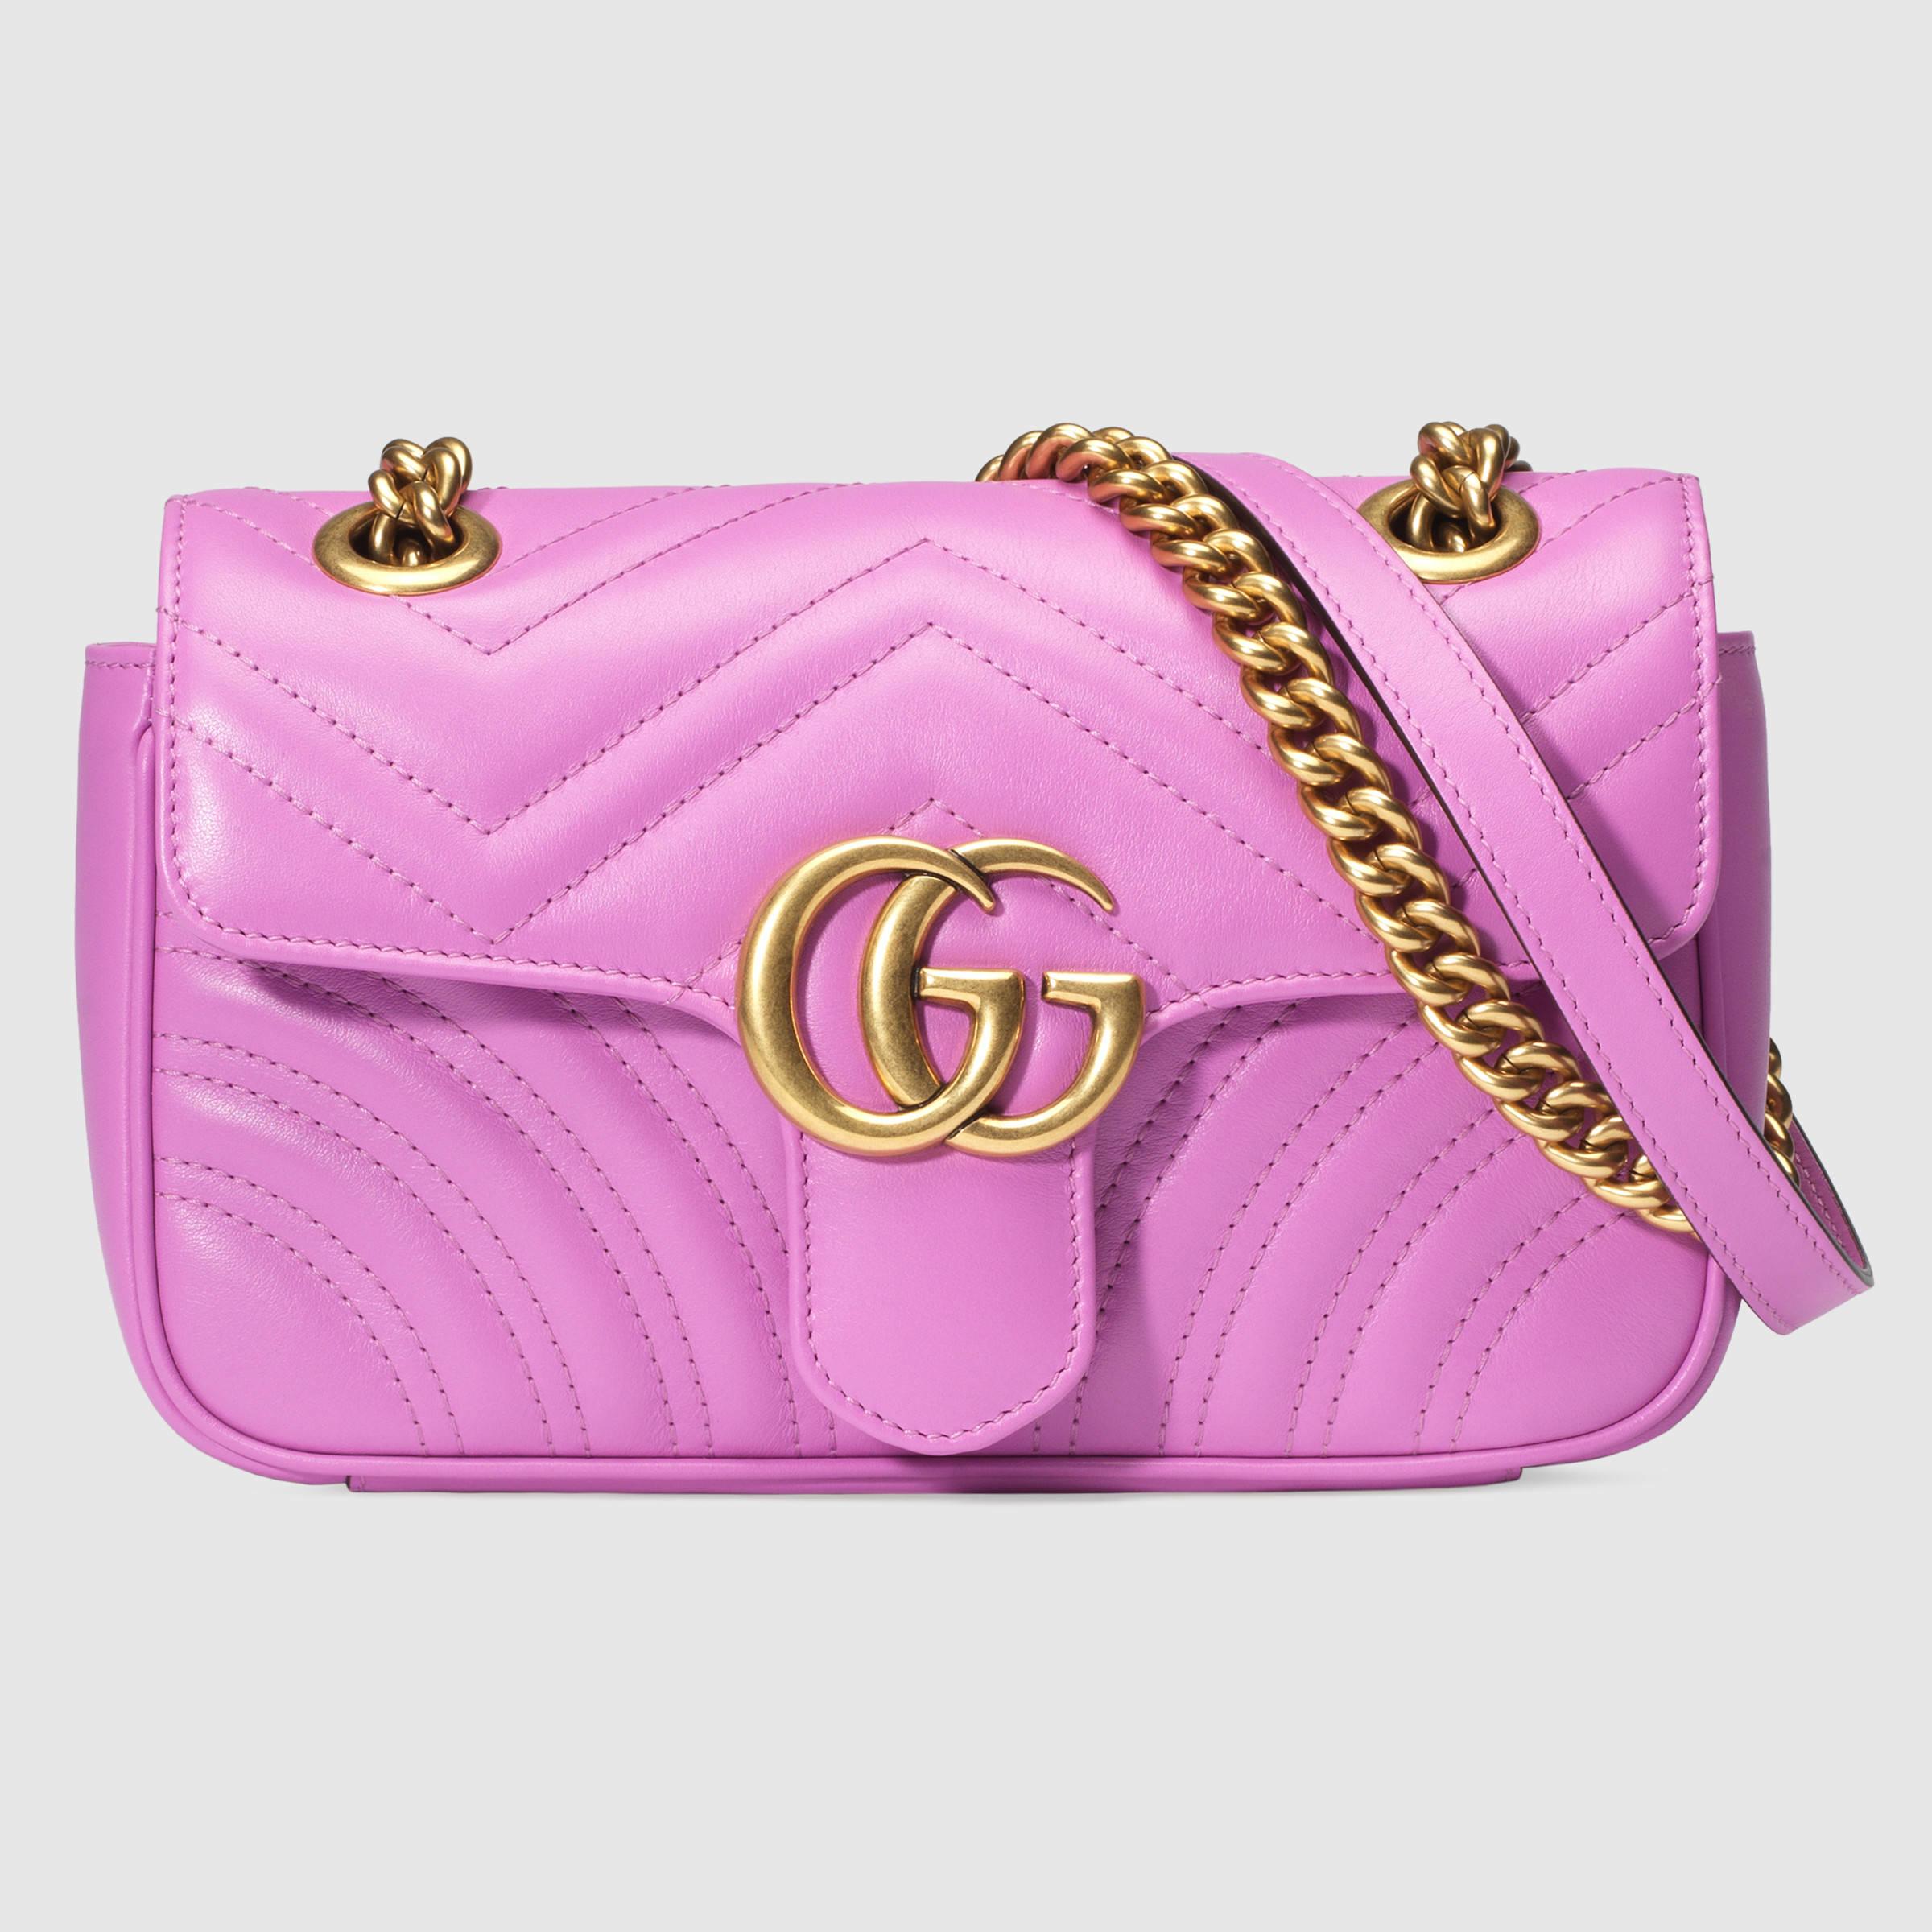 Gucci GG Marmont Matelassé Leather Mini Shoulder Bag in ...